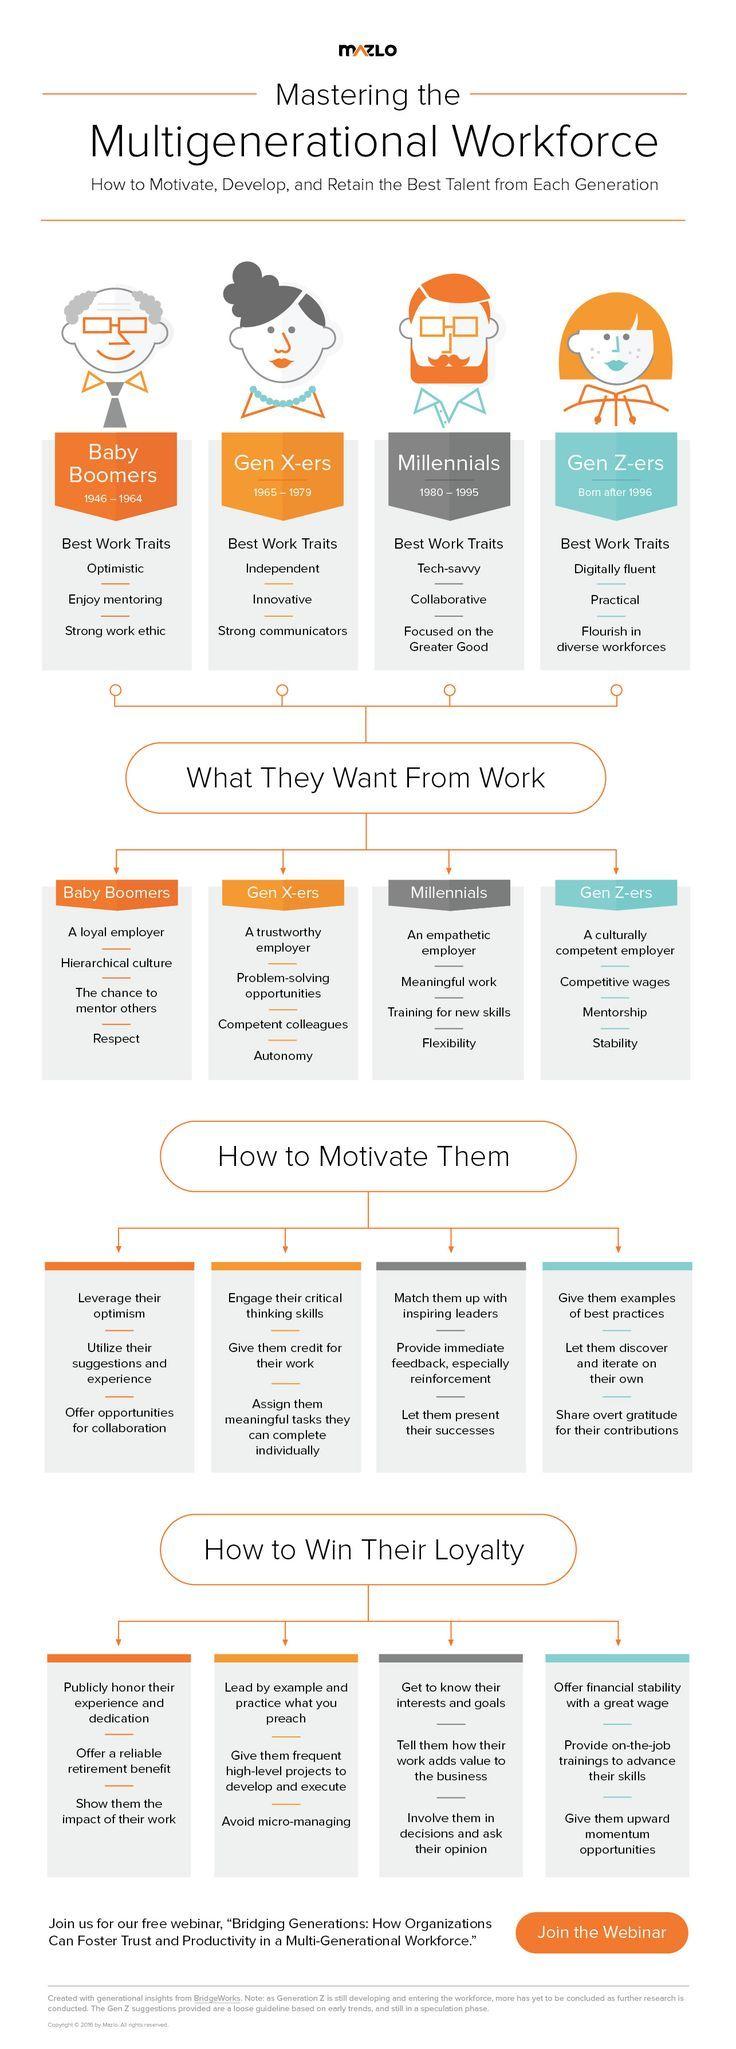 Mastering the Multigenerational Workforce